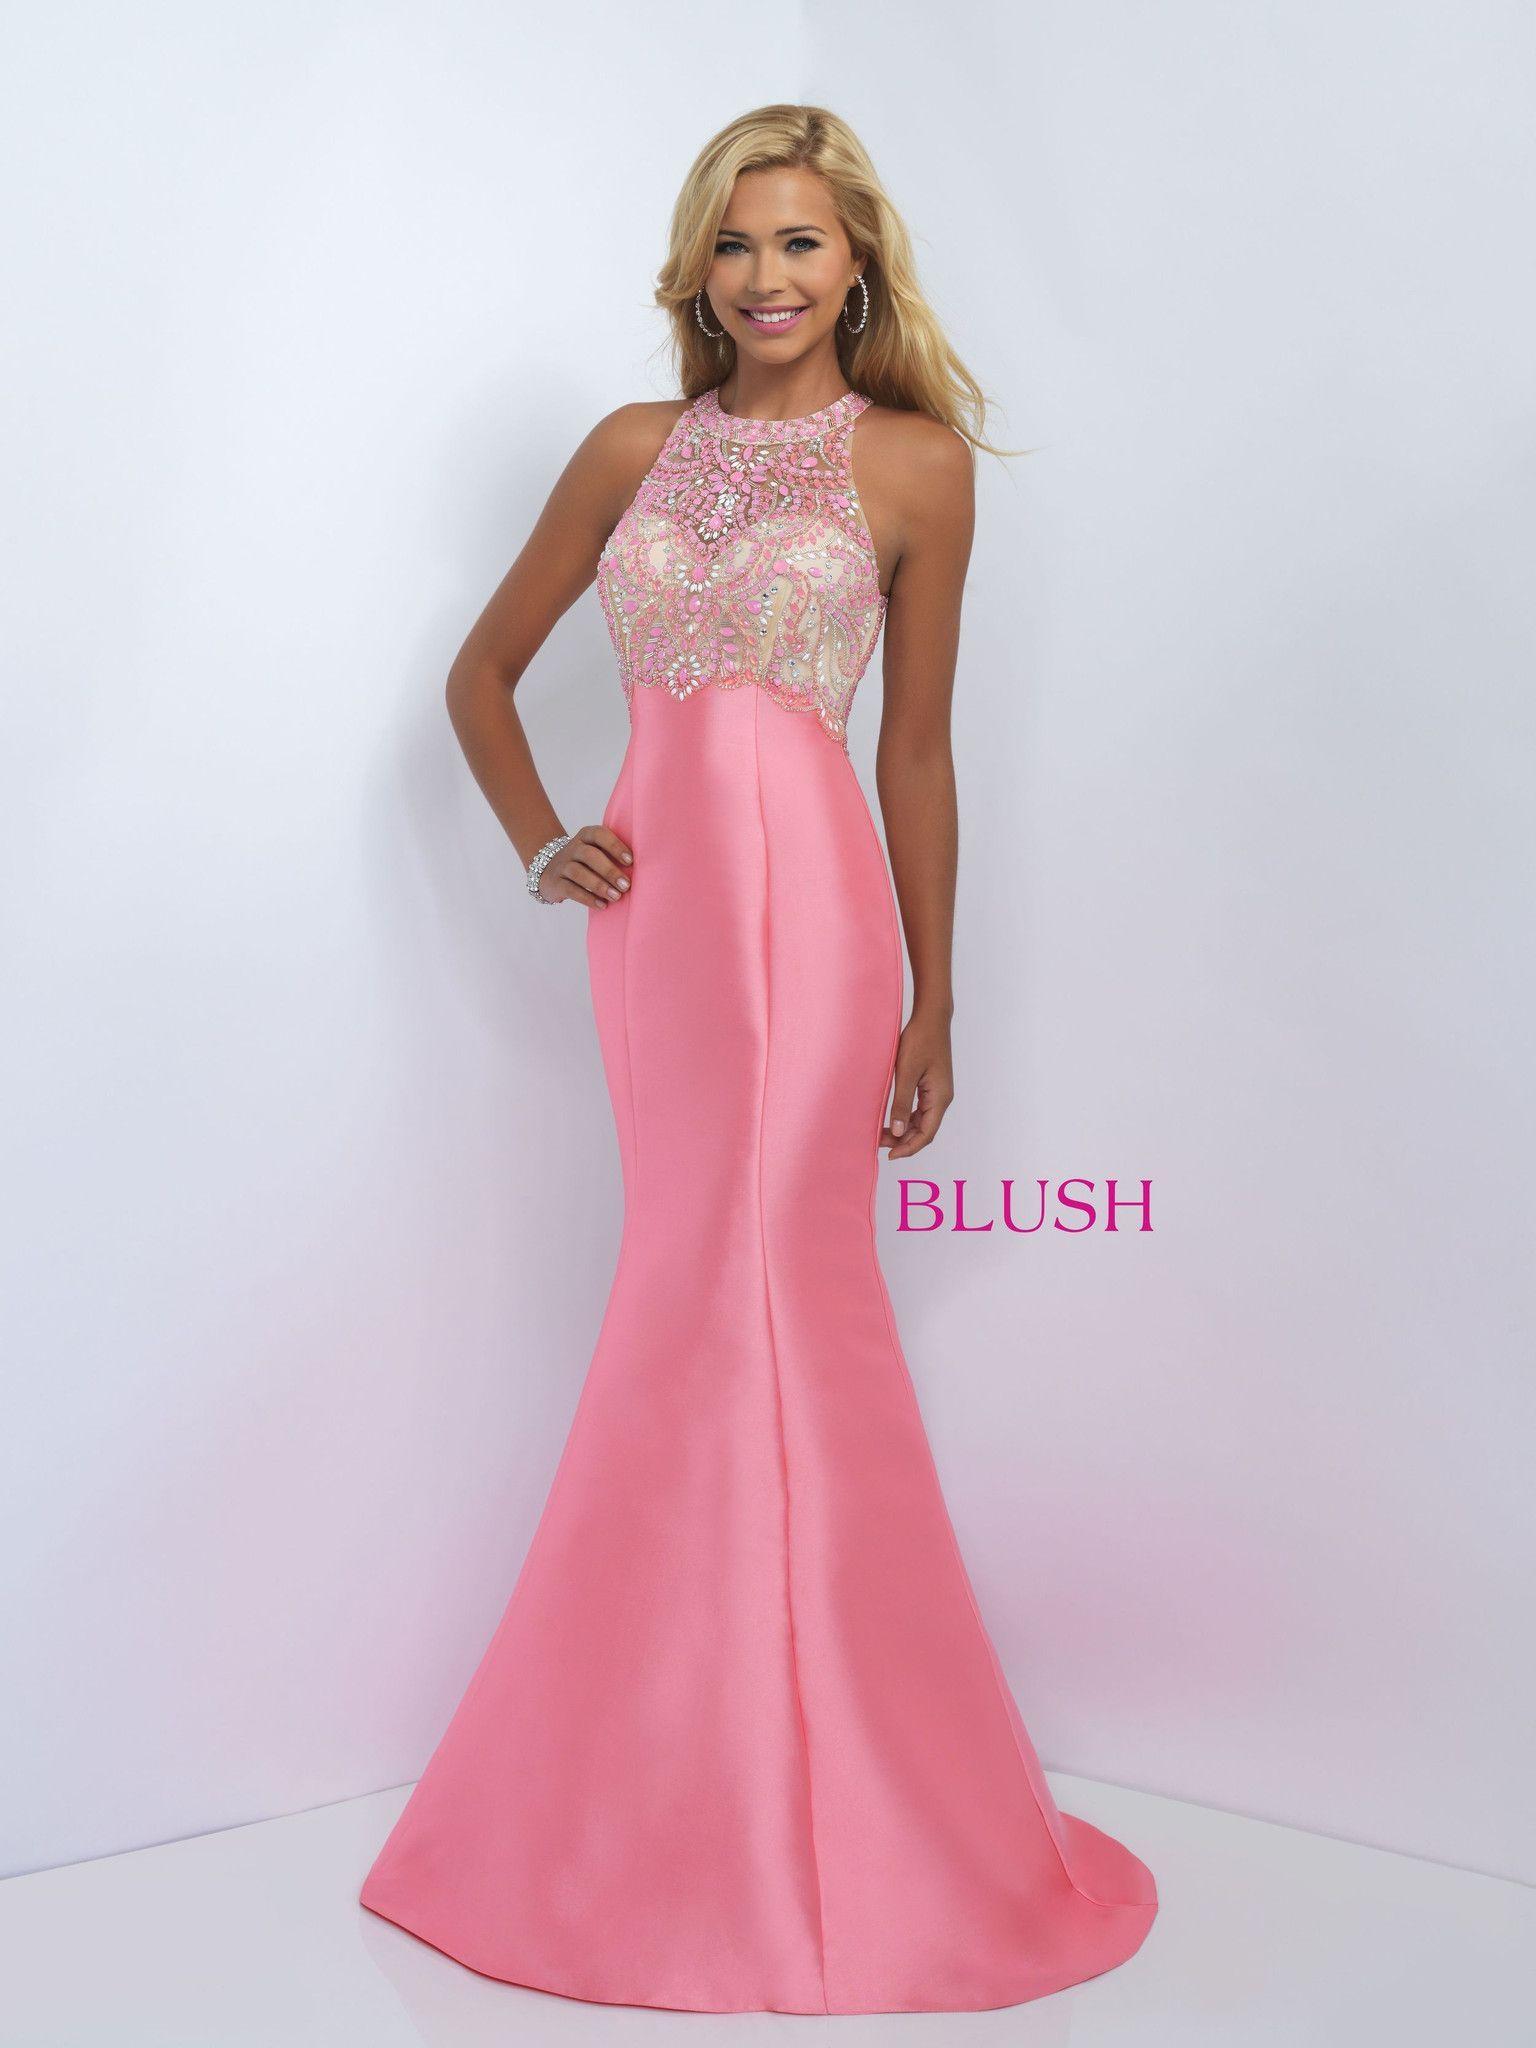 Blush prom coral pink prom dresses pinterest prom